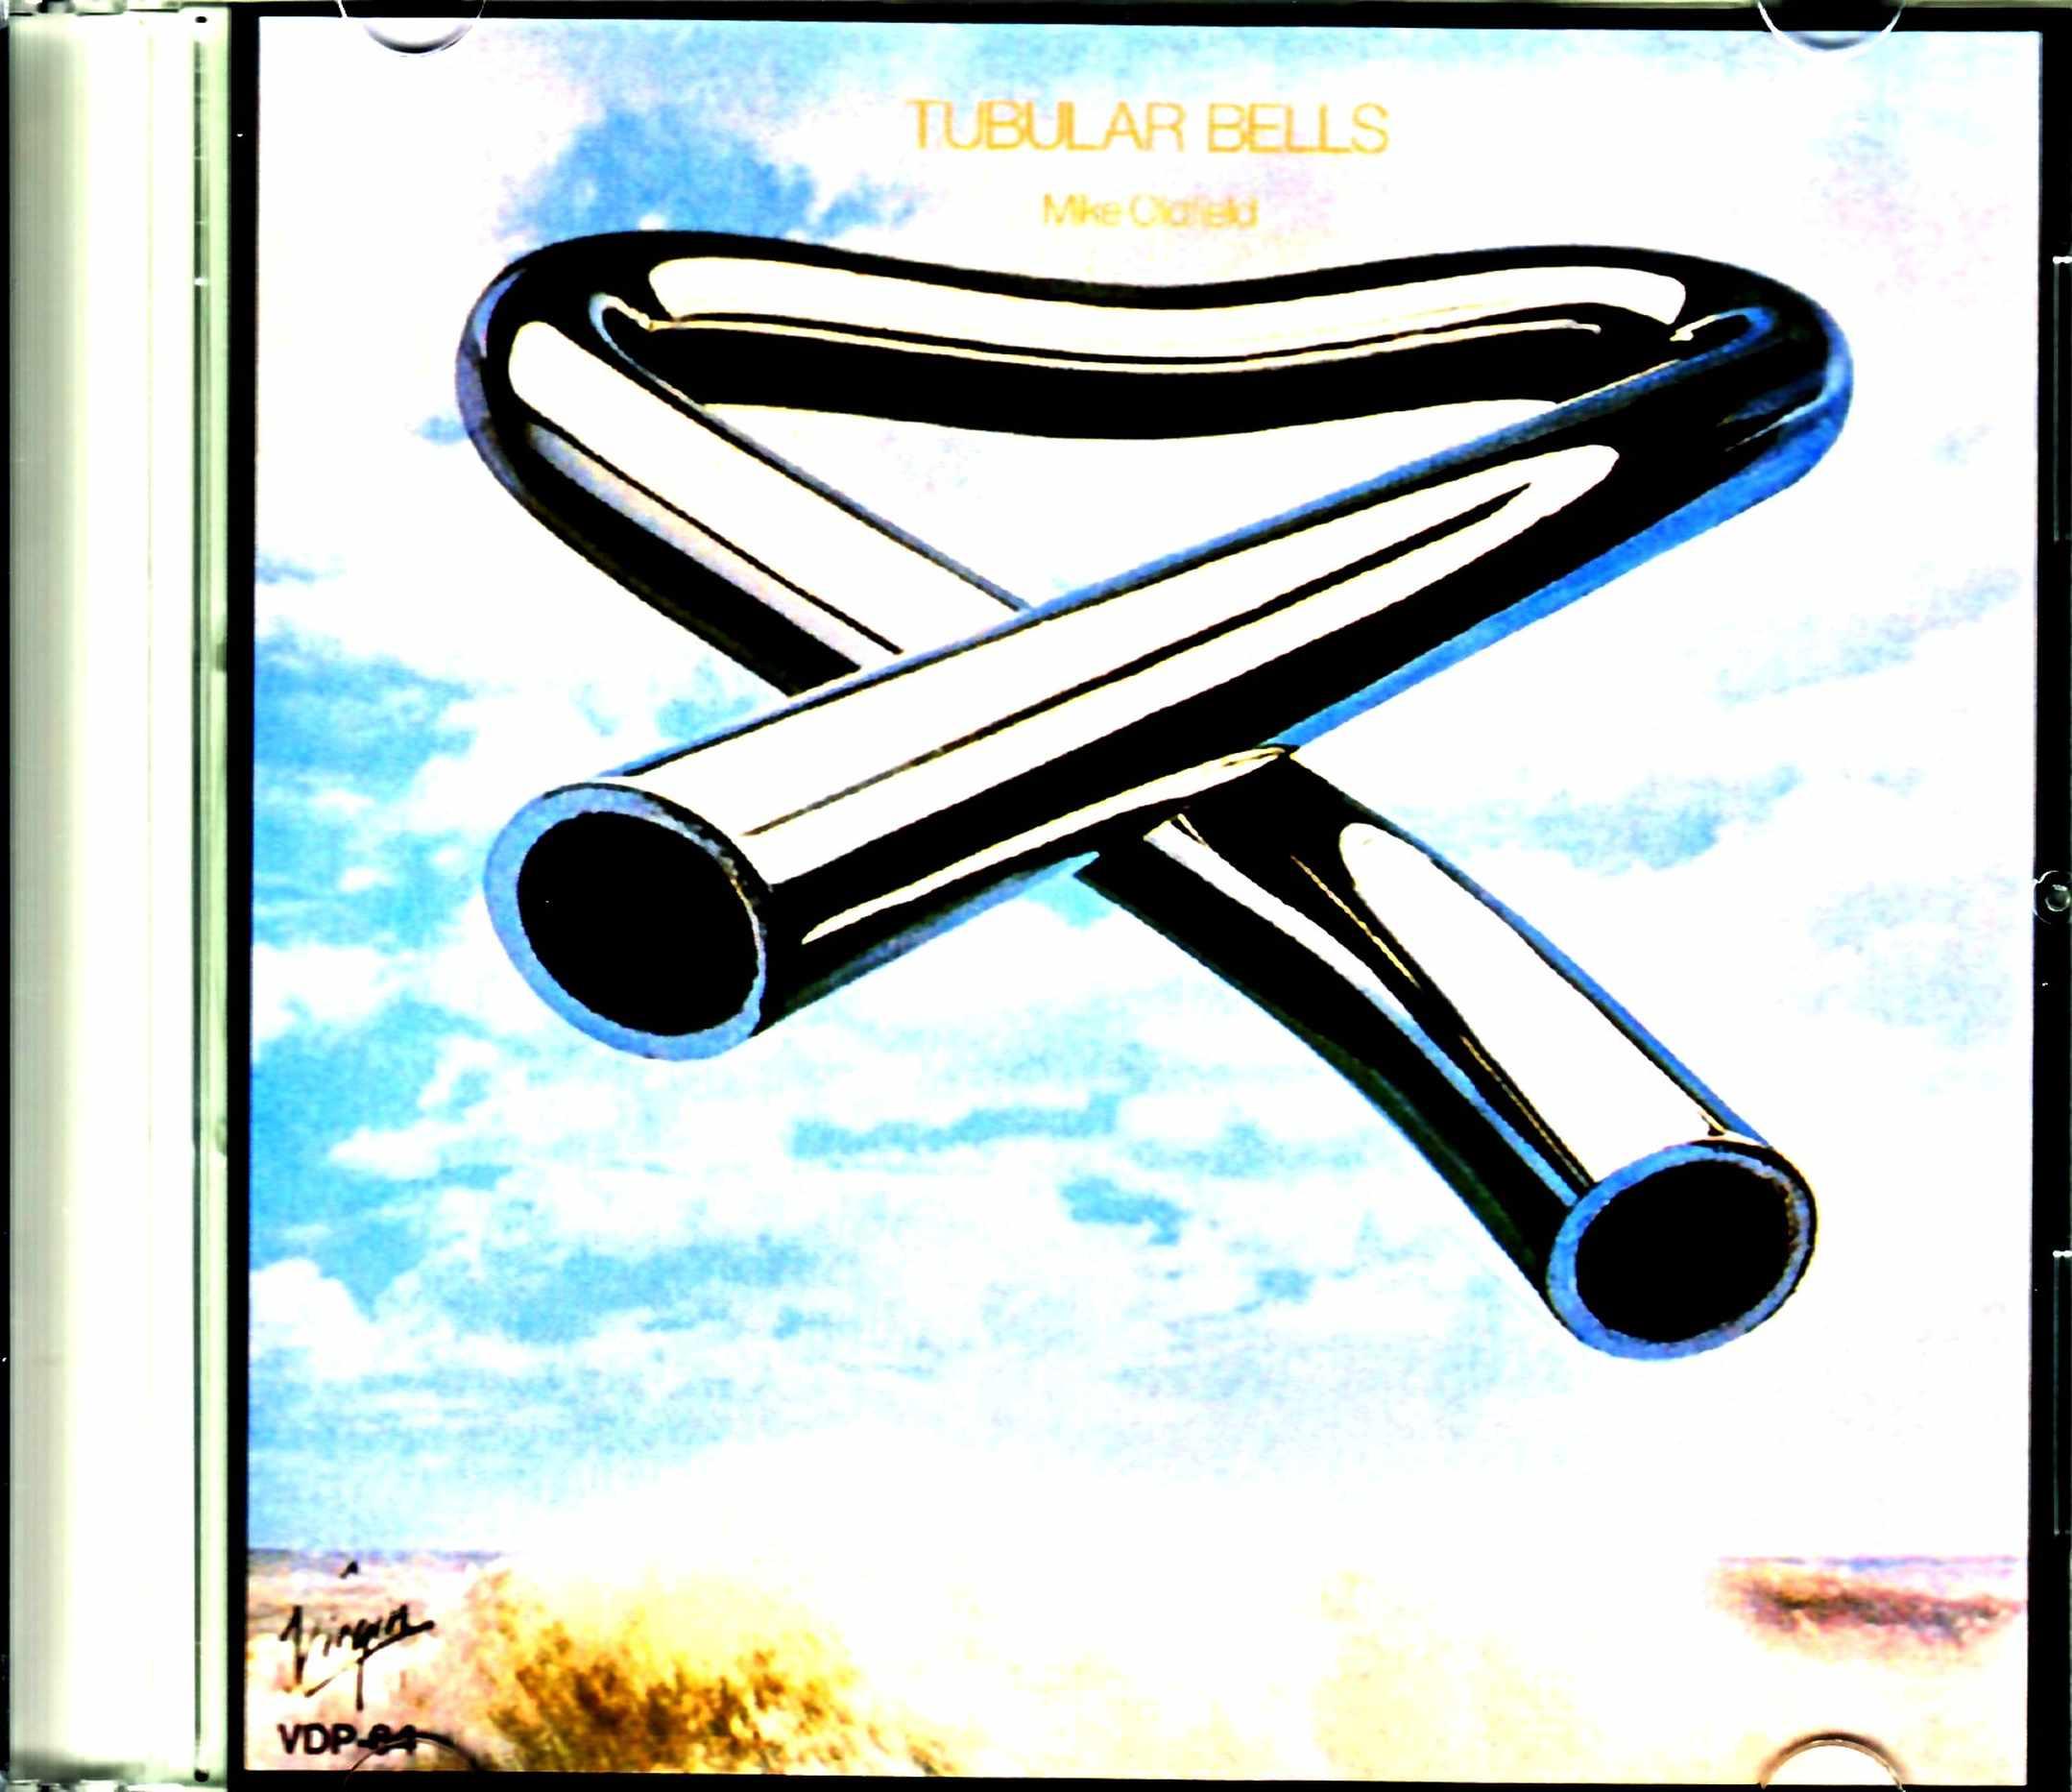 Mike Oldfield マイク・オールドフィールド/チューブラー・ベルズ Tubular Bells Original Japanese CD